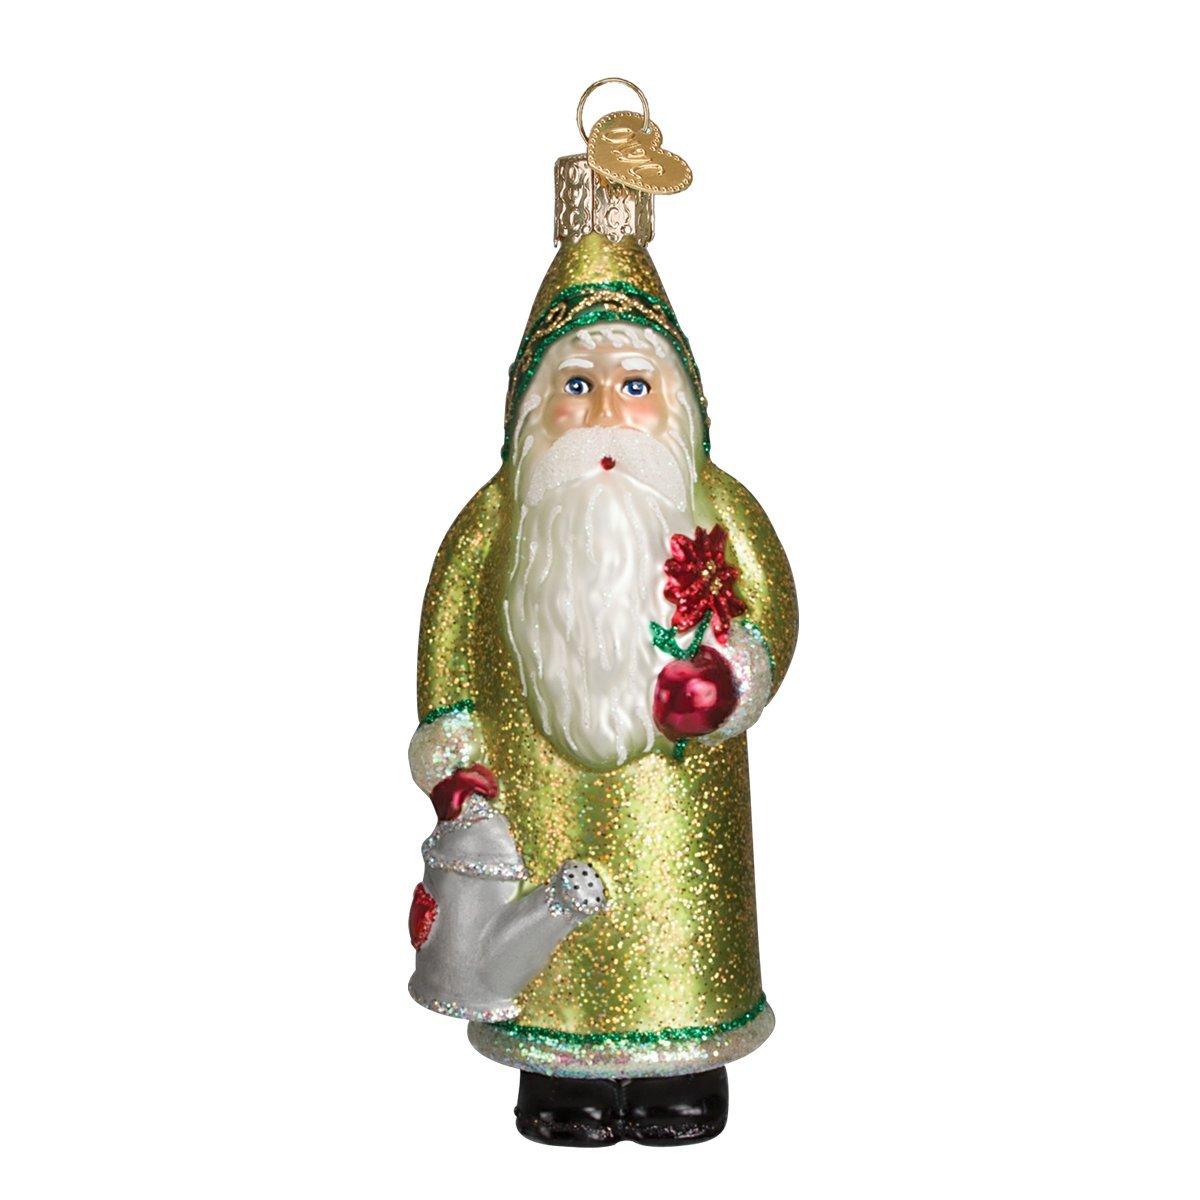 Old World Christmas Blooming Santa Glass Blown Ornament